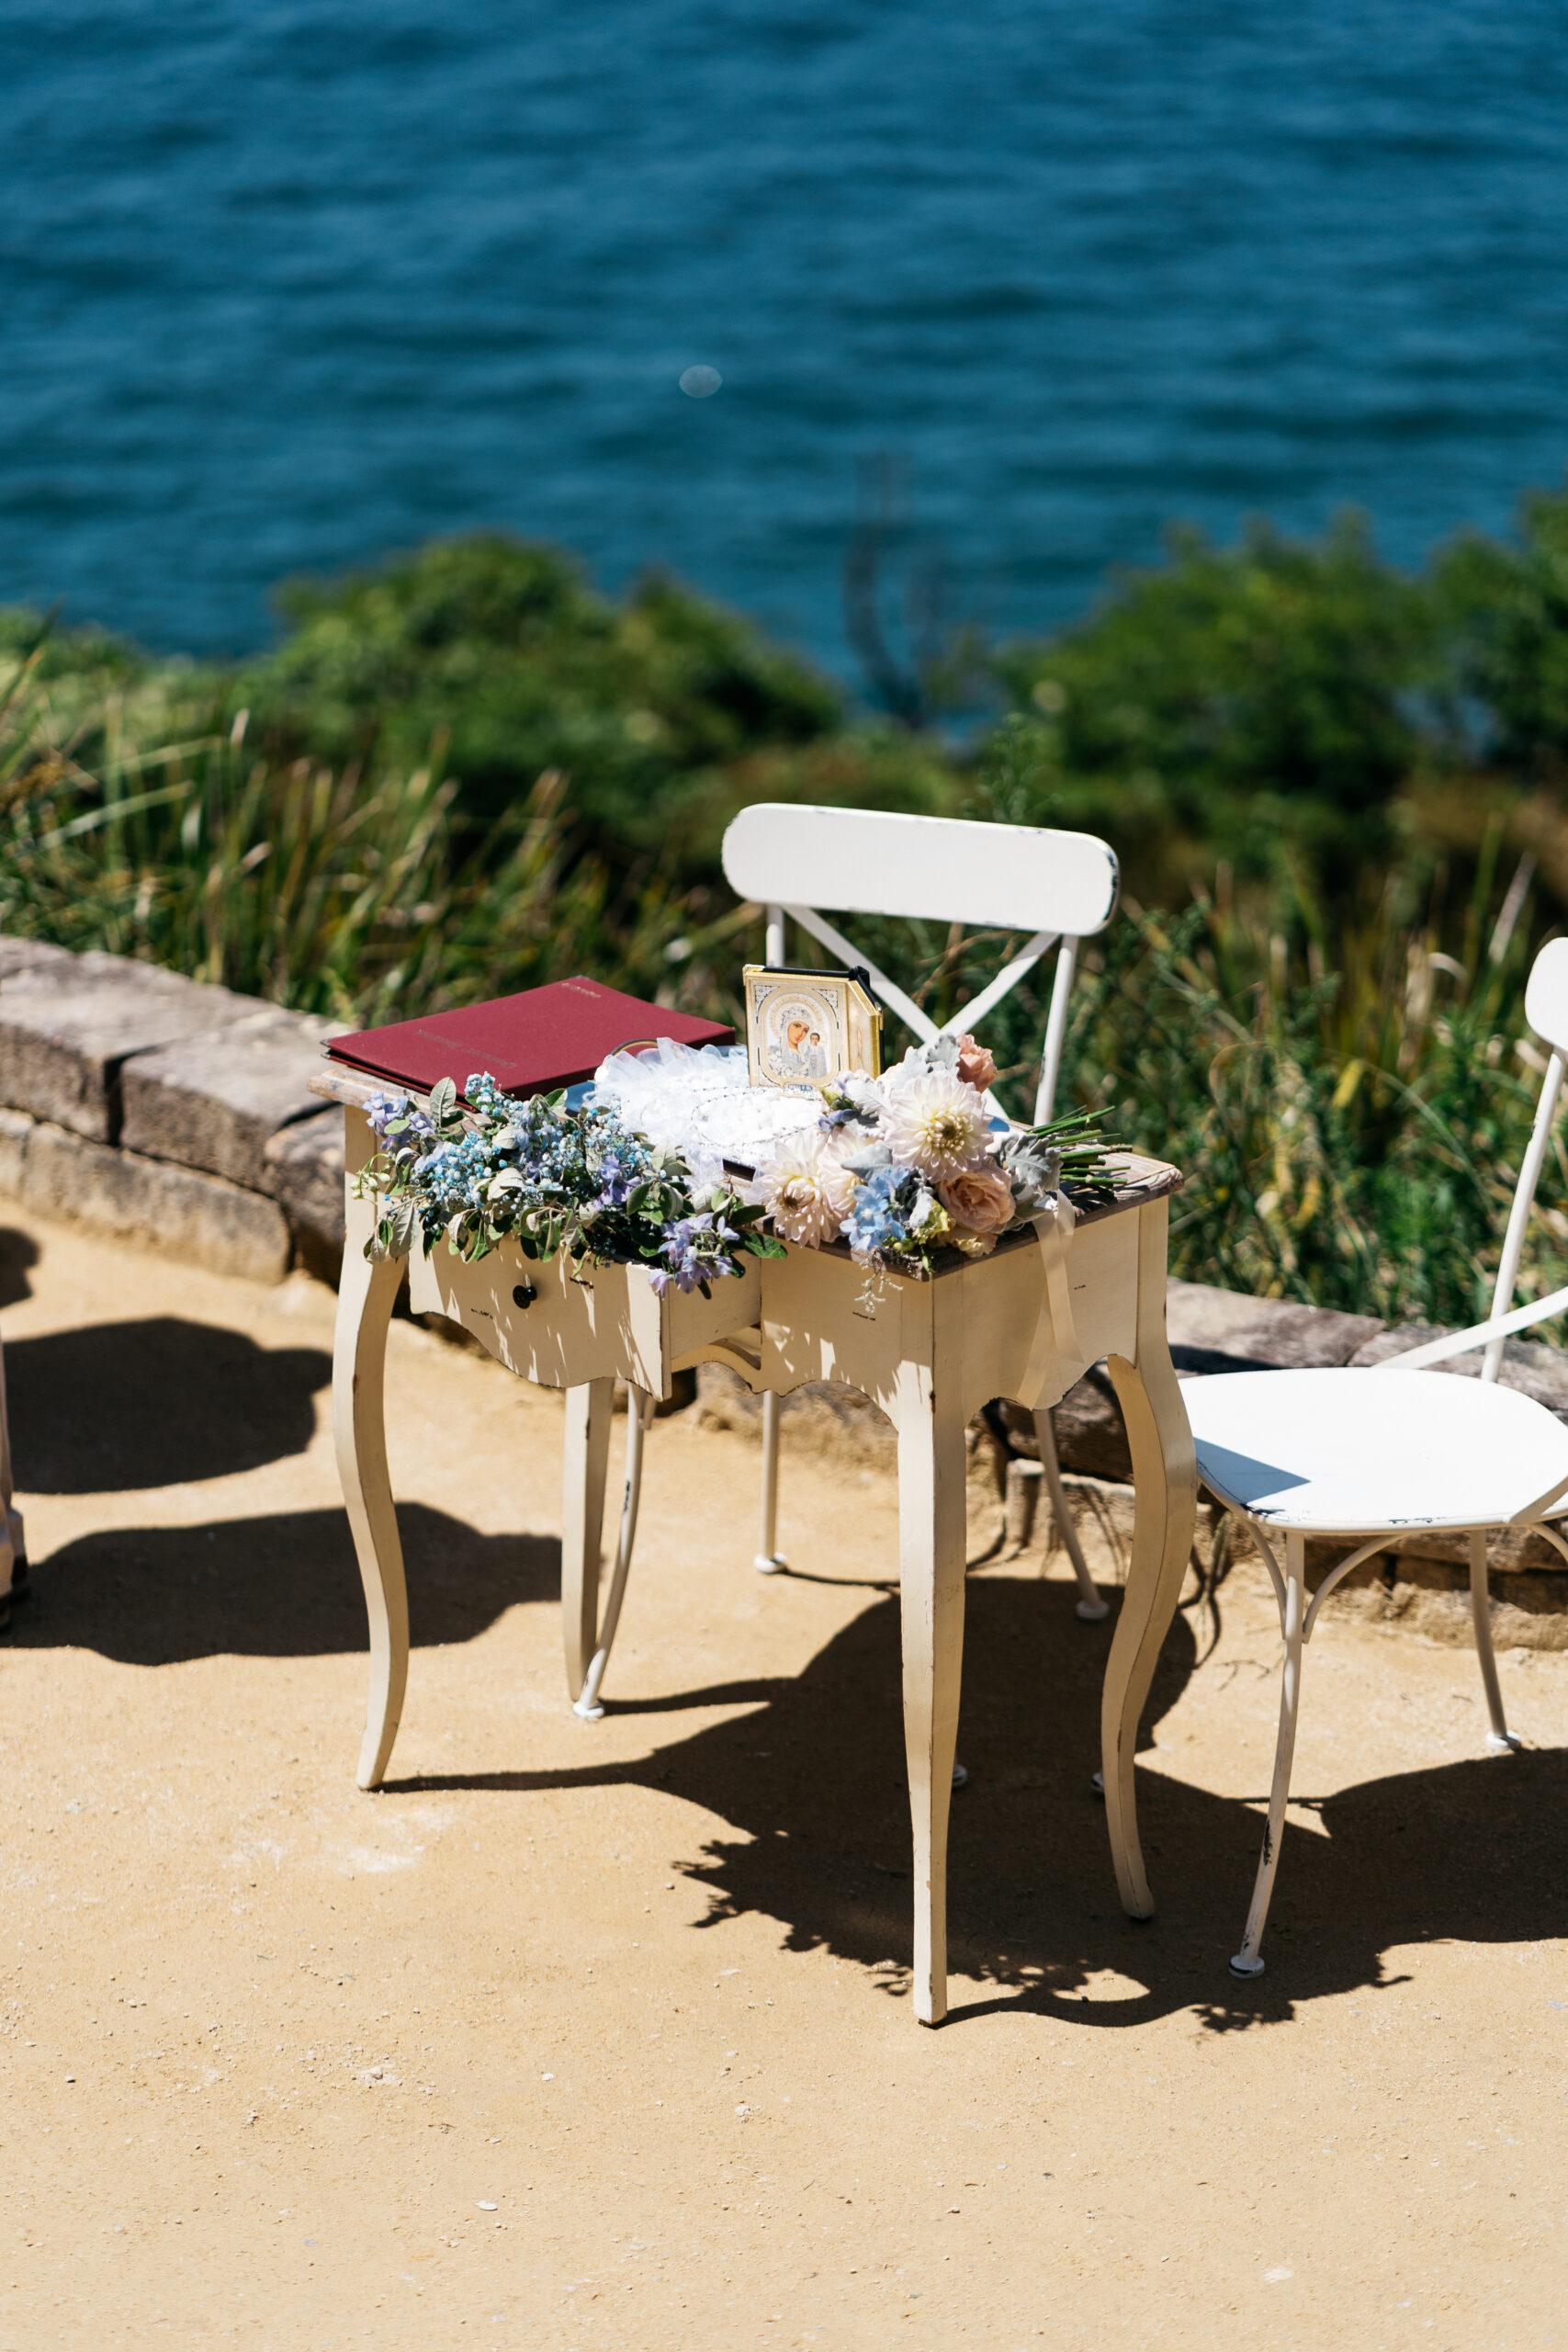 outdoor wedding table setup | Tumbleweed Events